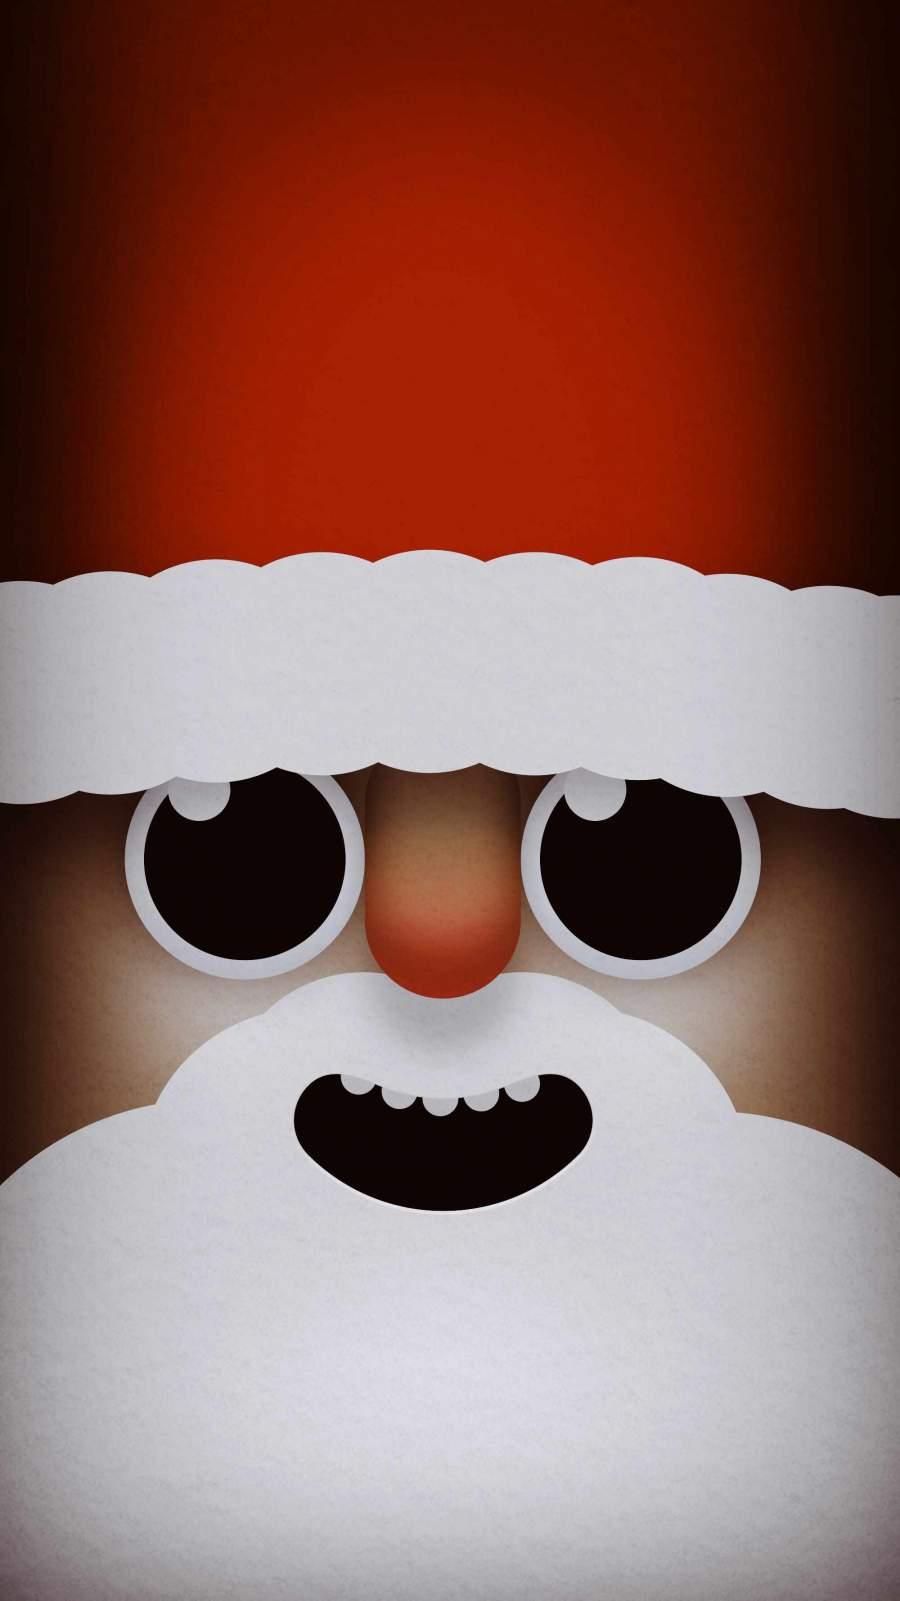 Santa Face iPhone Wallpaper